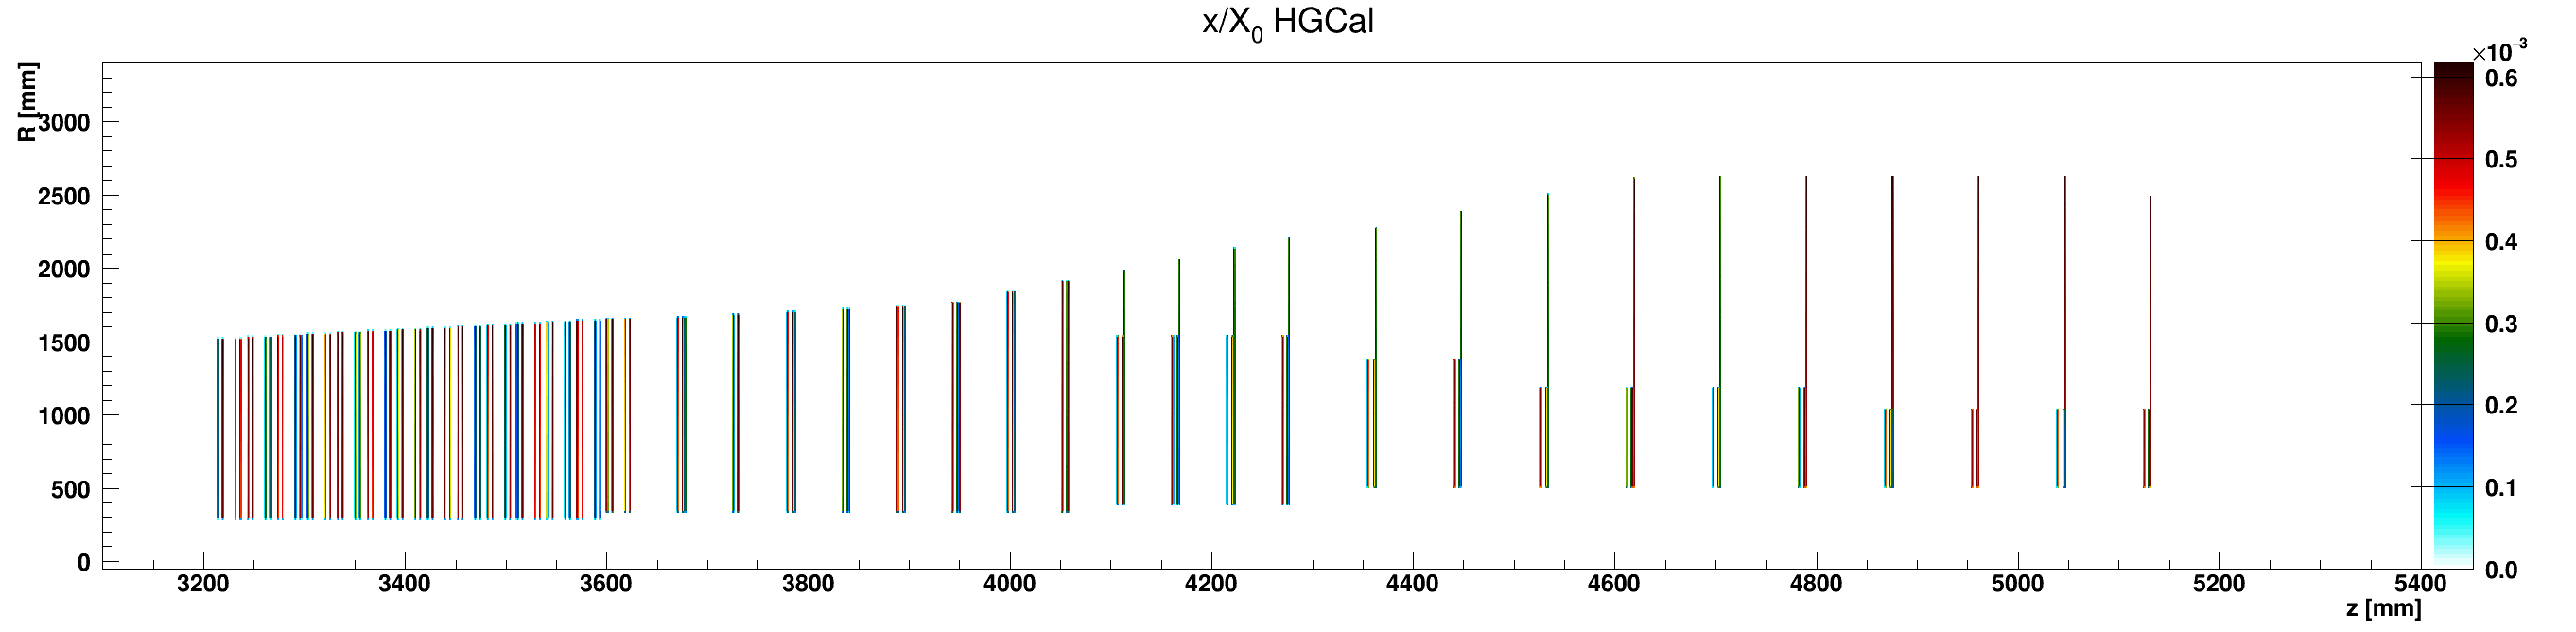 HGCal_x_vs_z_vs_RlocHGC_G10-FR4_ZplusZoom.png